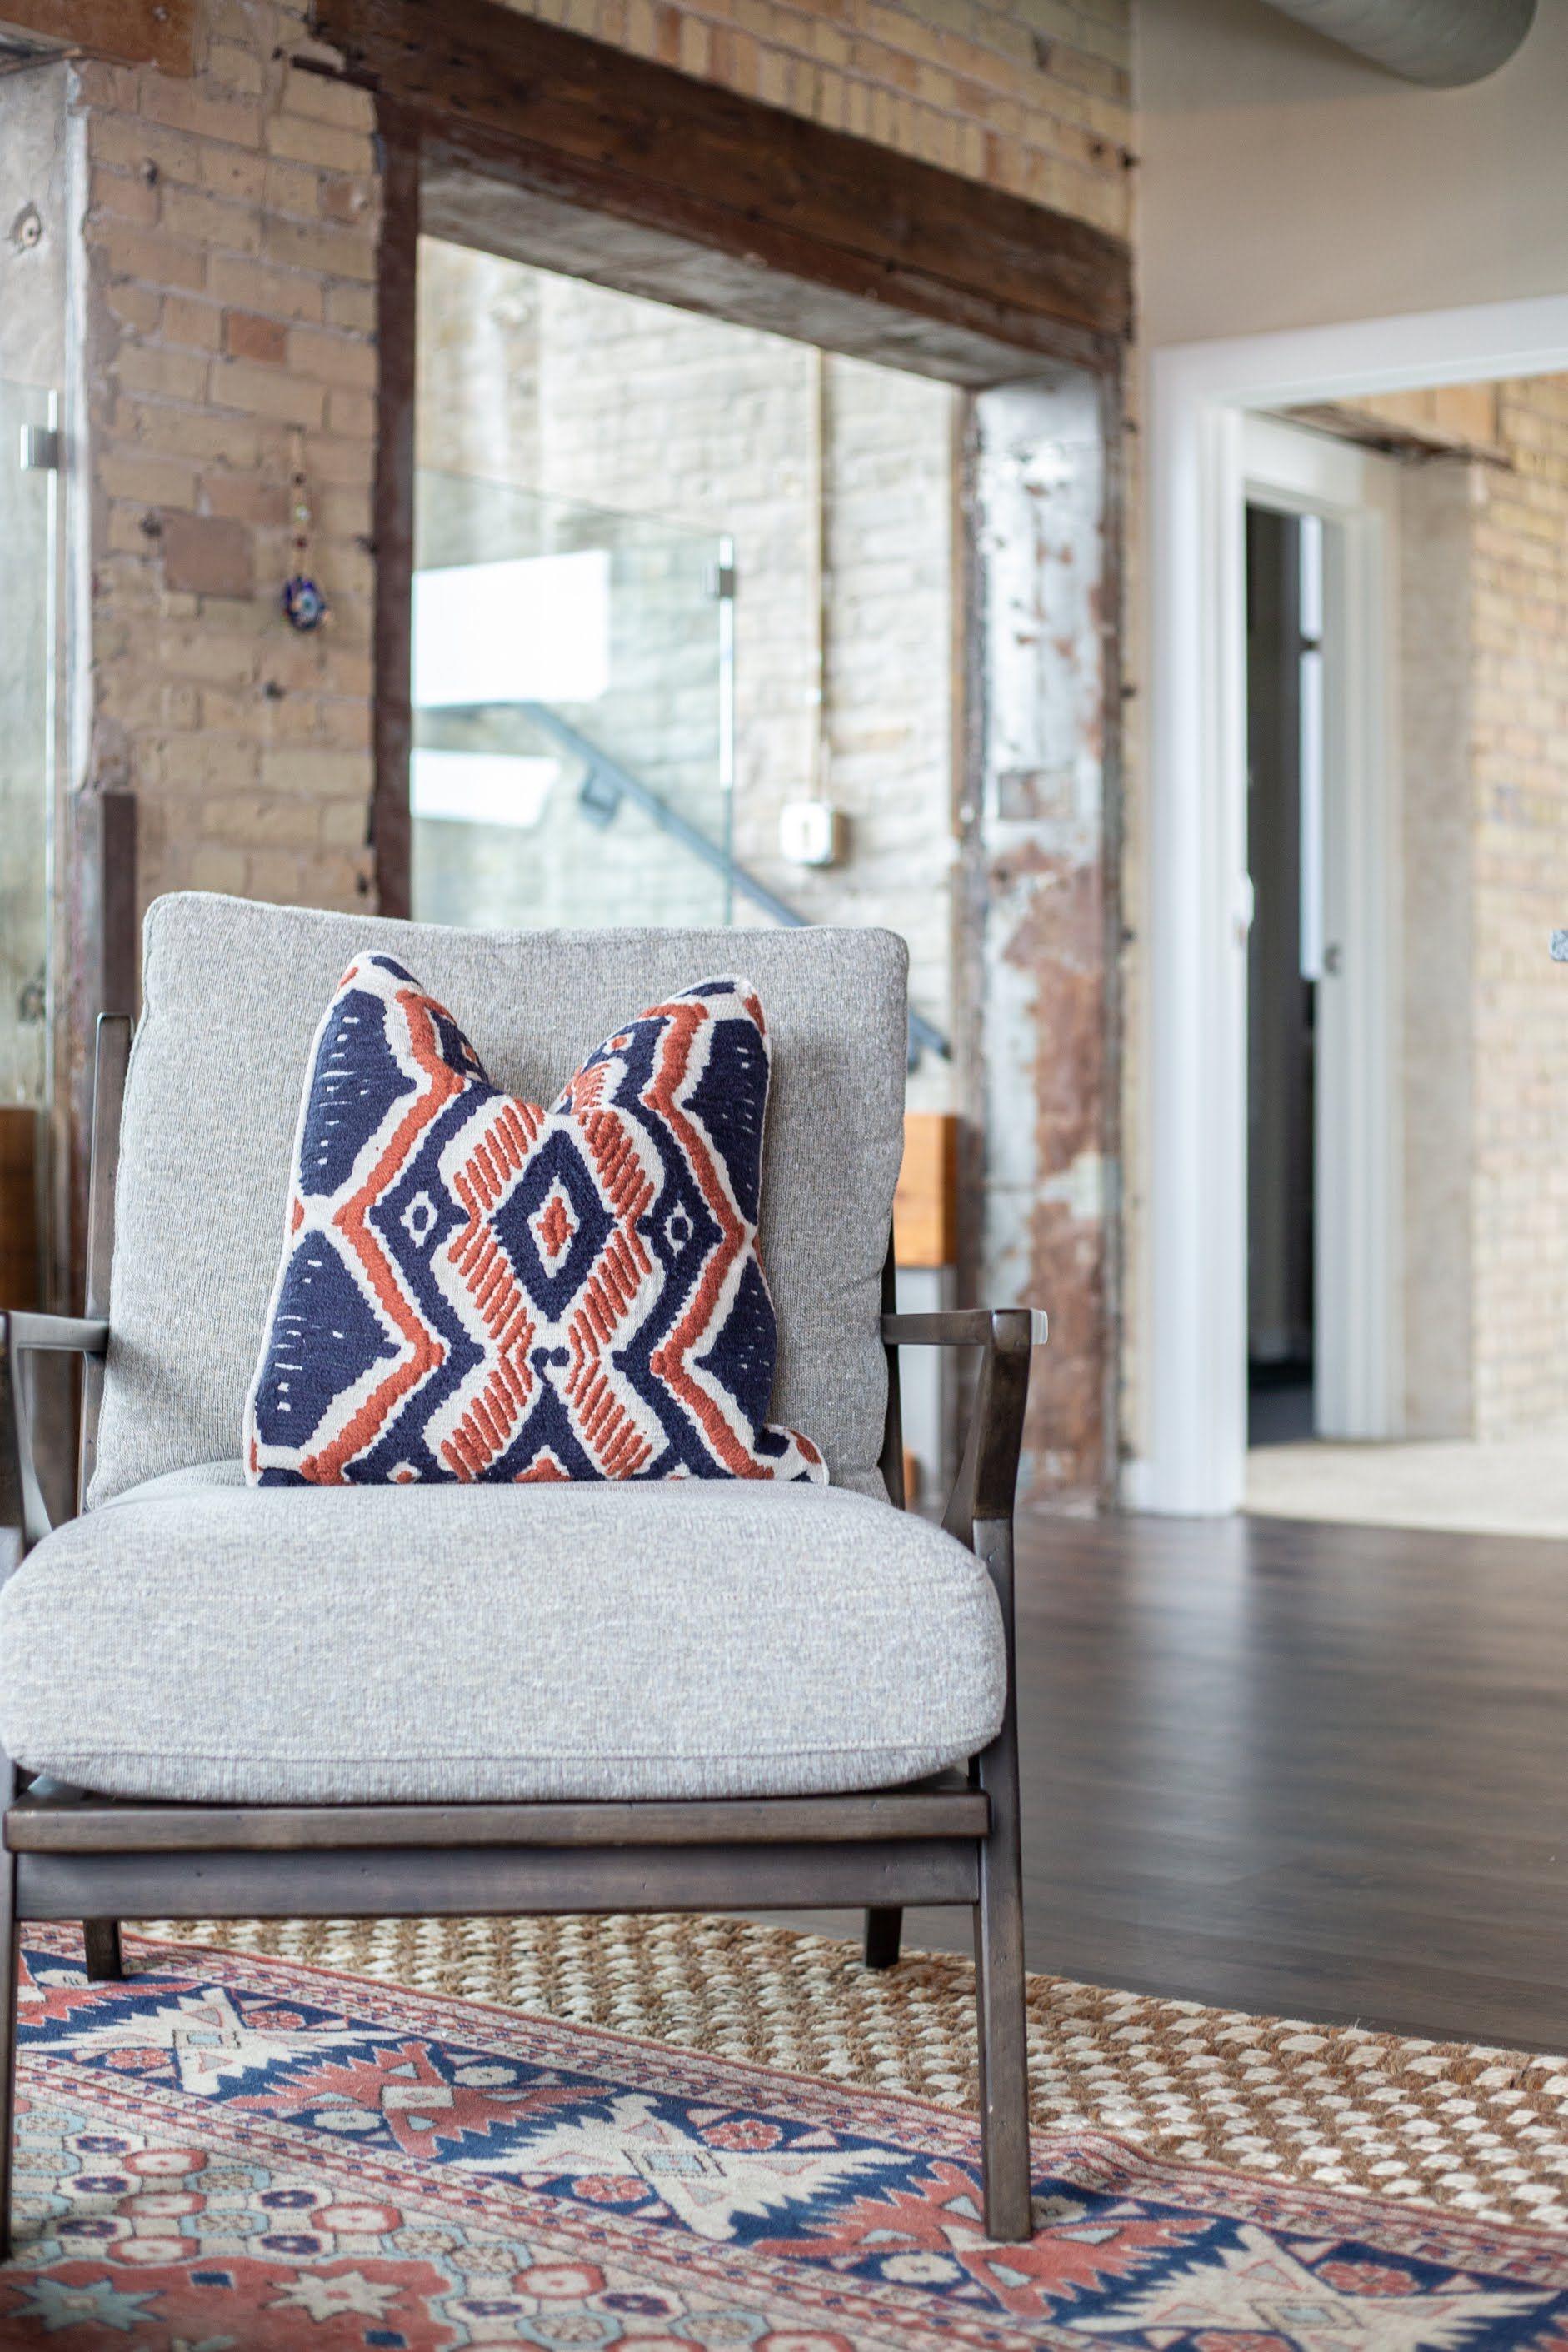 Industrial Living Room Ideas And Inspiration In 2020 Interior Design Inspiration Interior Design Industrial Livingroom